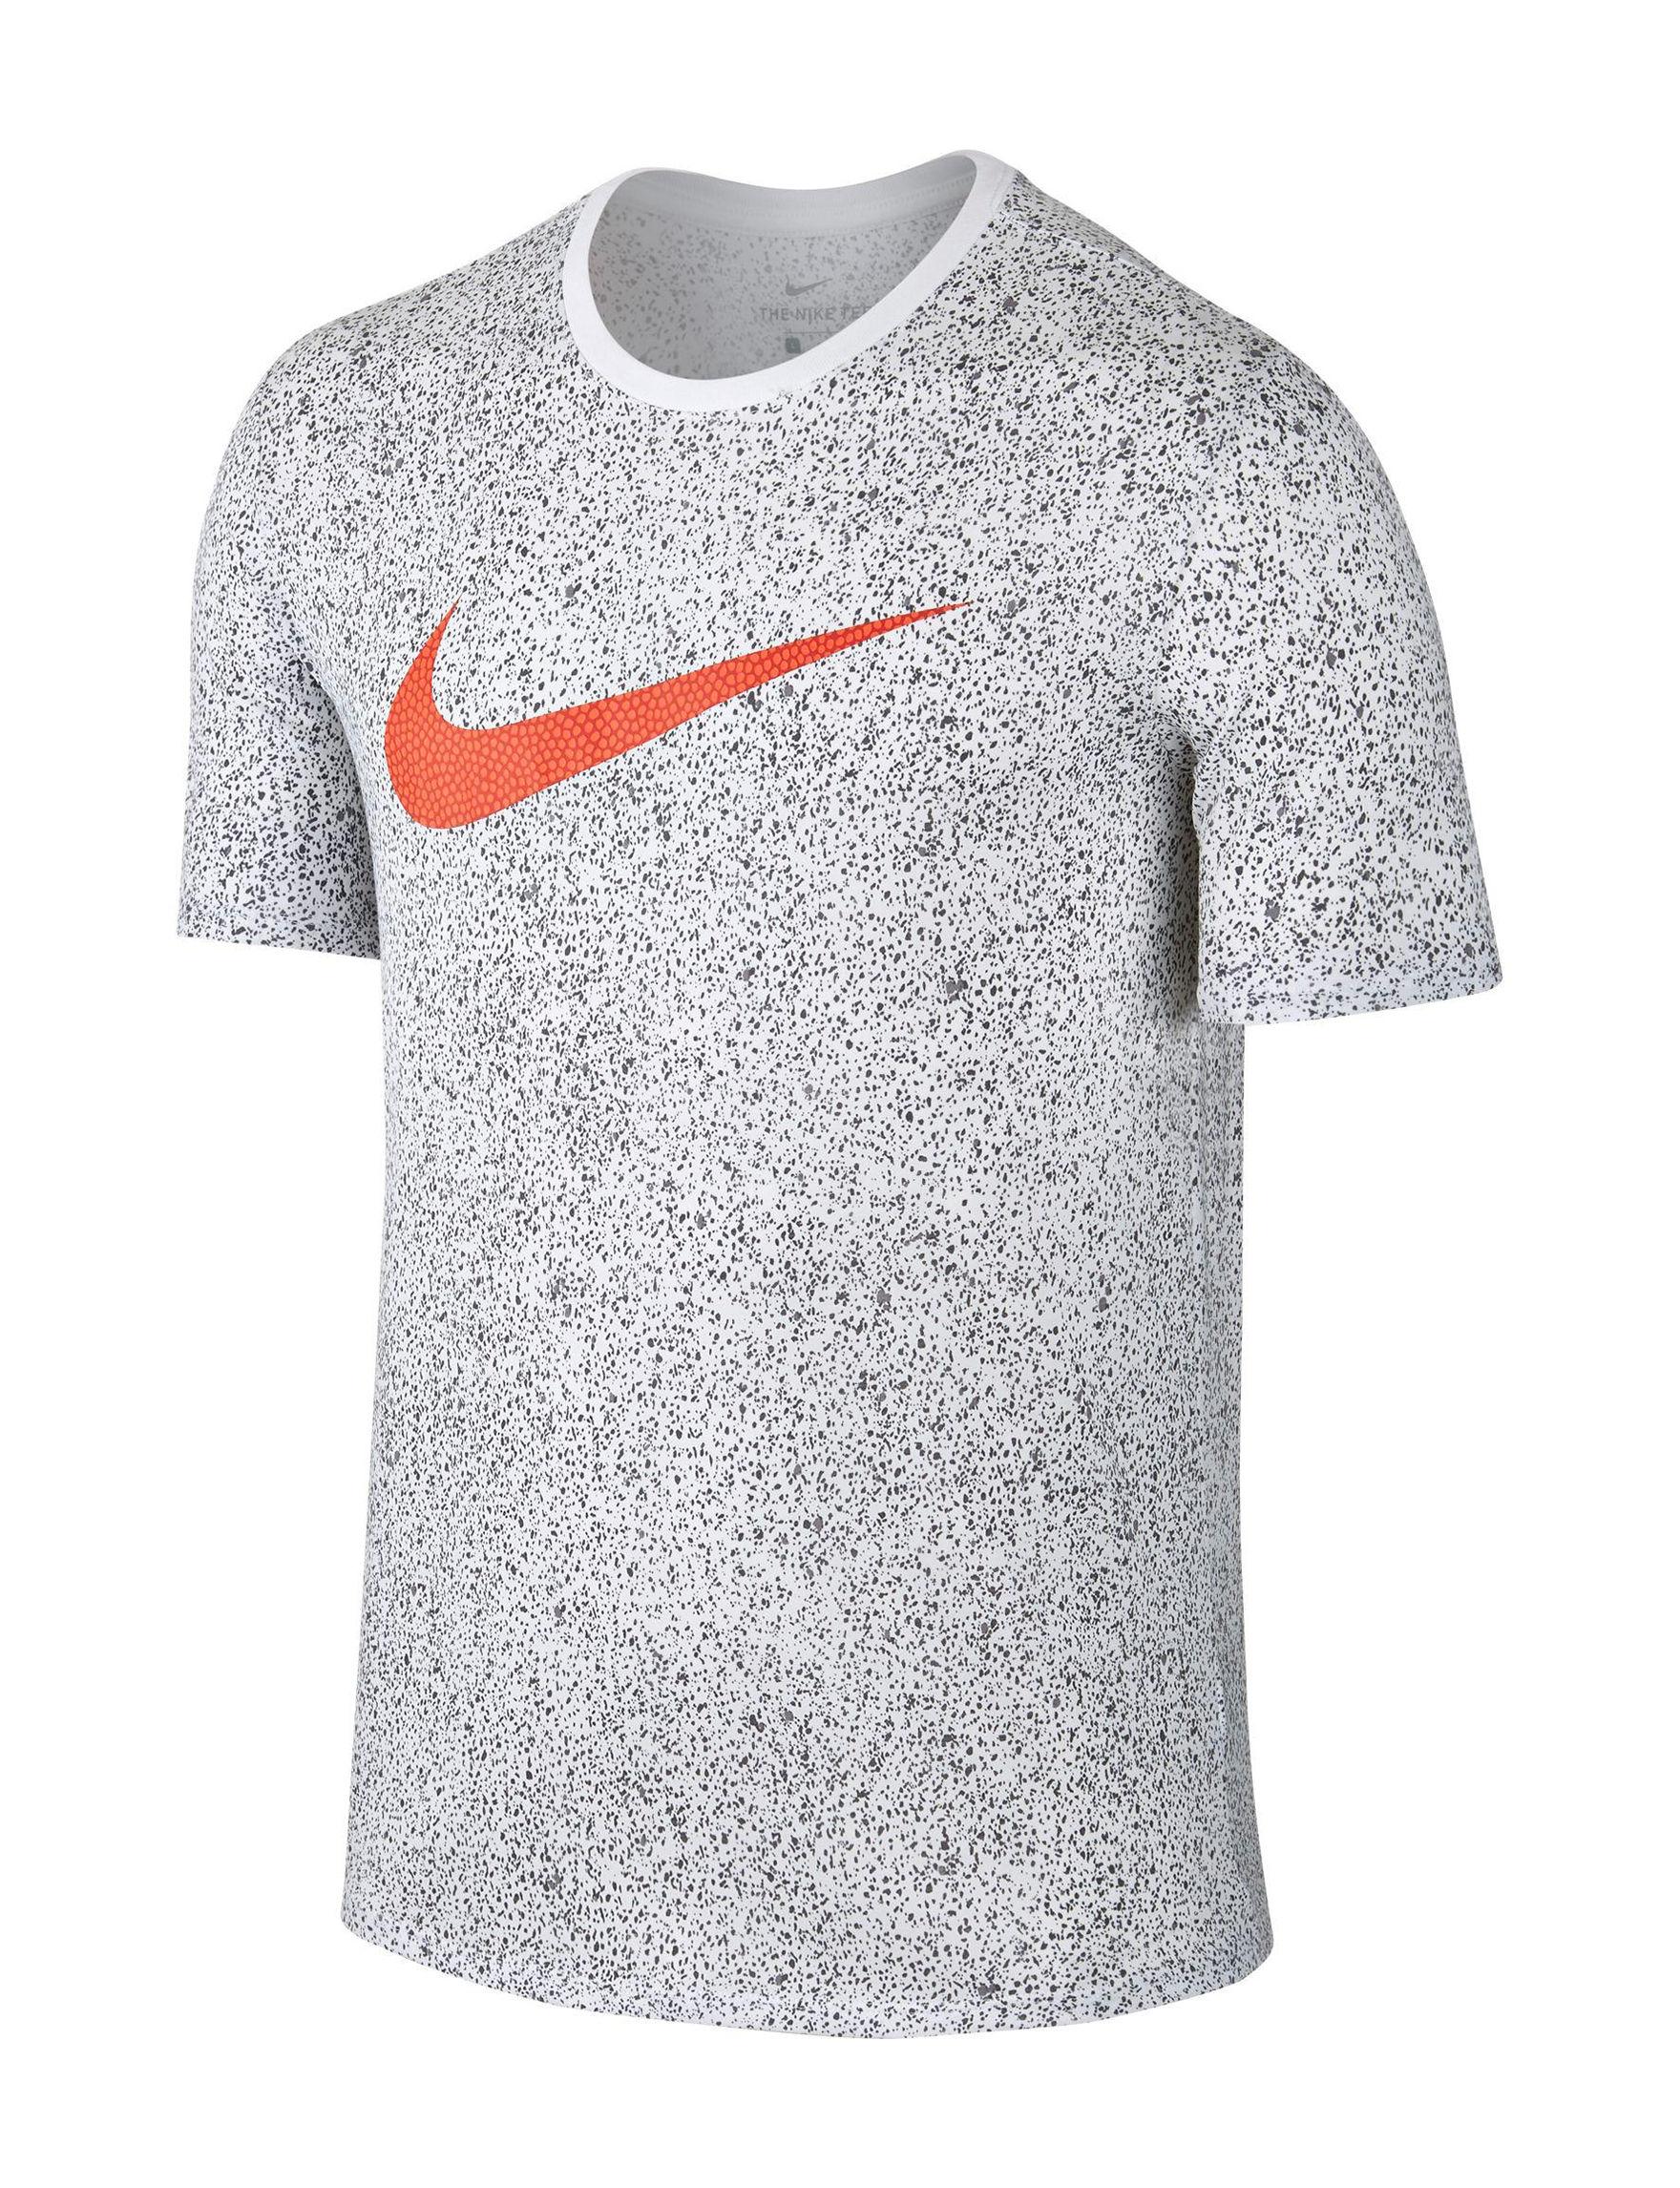 Nike White / Orange Tees & Tanks